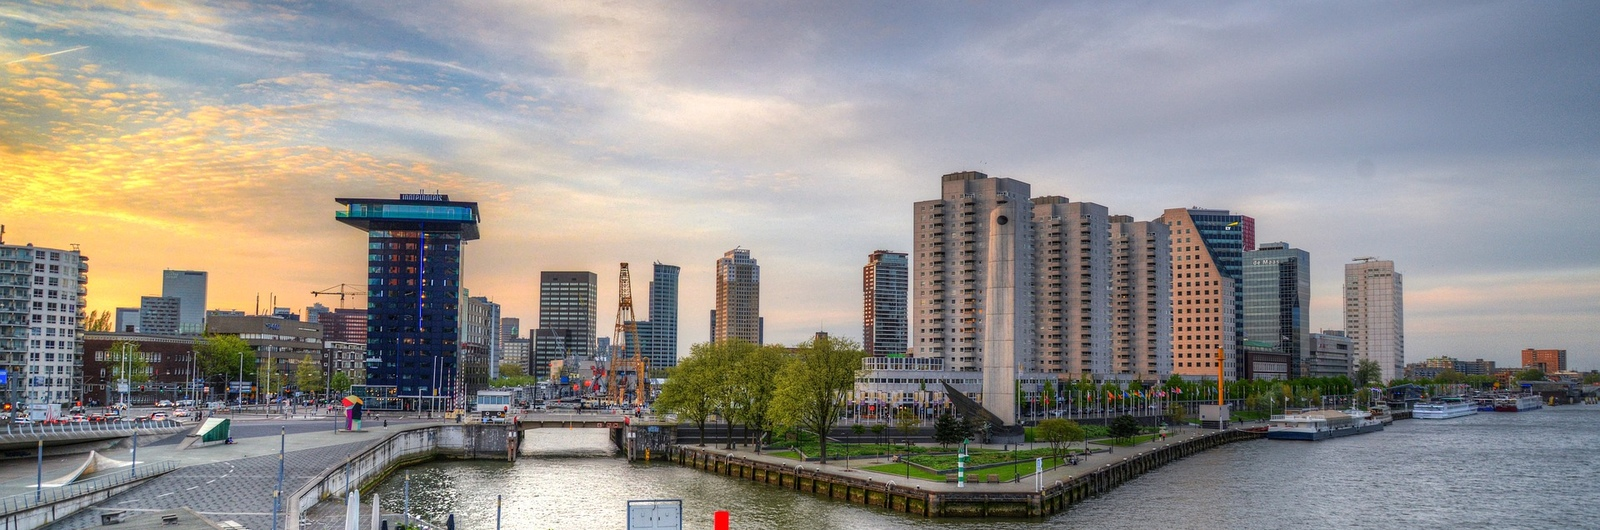 rotterdam city header